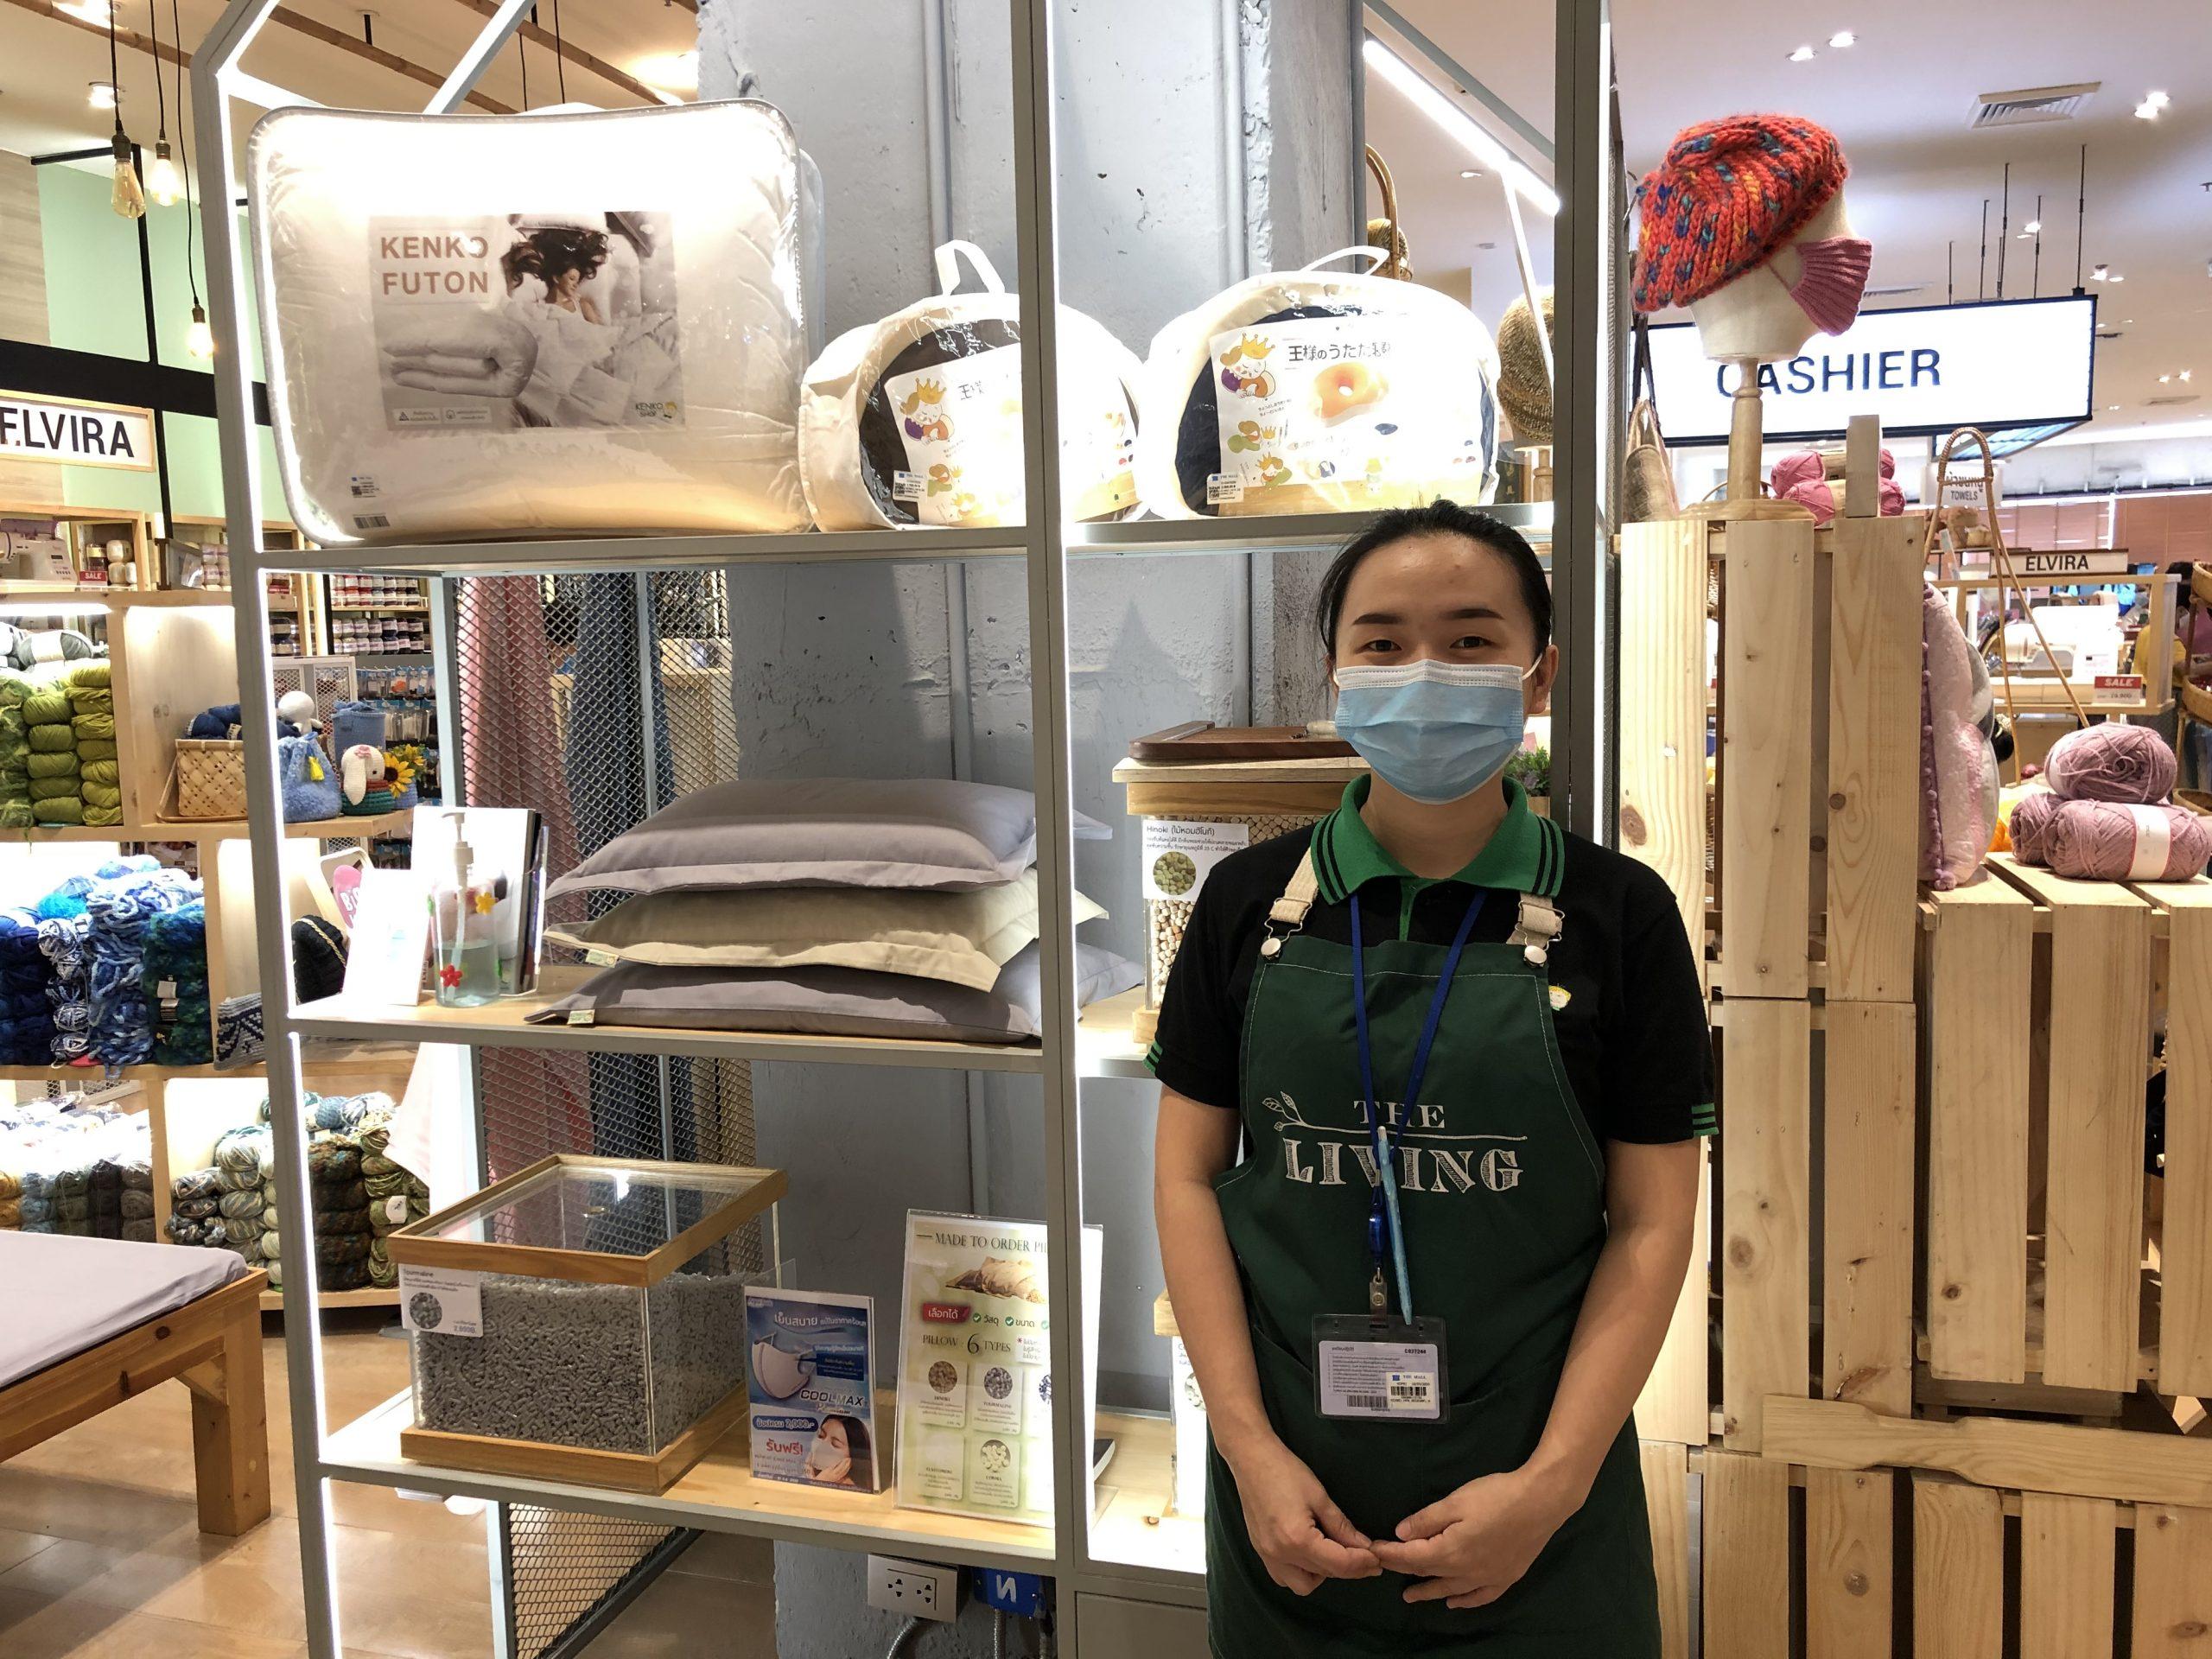 kenko shop สาขาเดอะมอลล์งามวงศ์วาน ชั้น 4